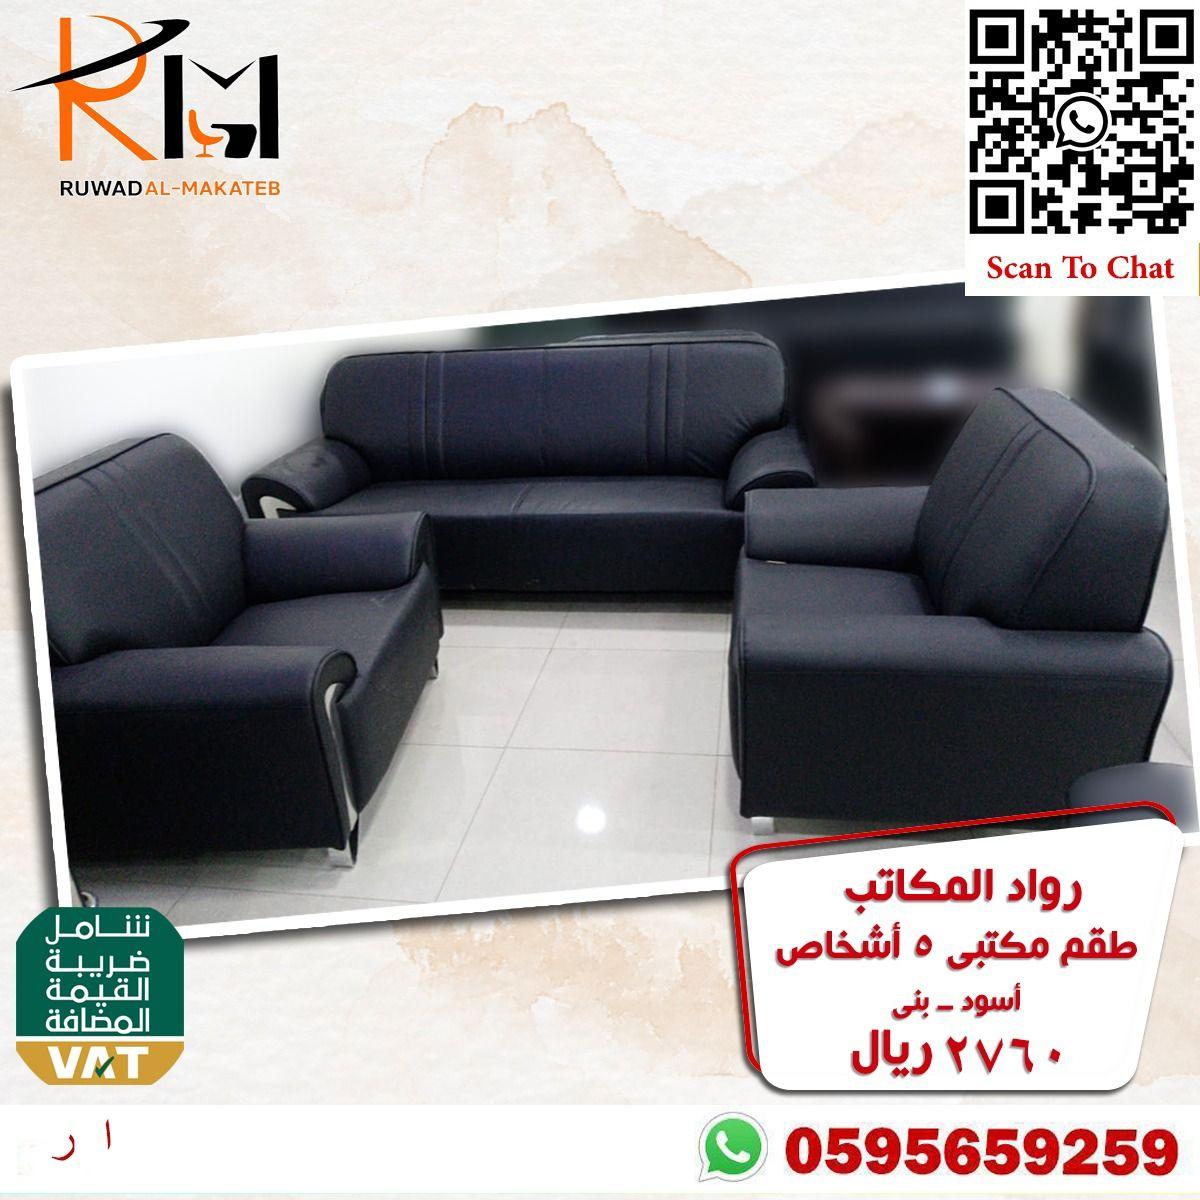 كنب اسود مكتبي In 2021 Sectional Couch Couch Sofa